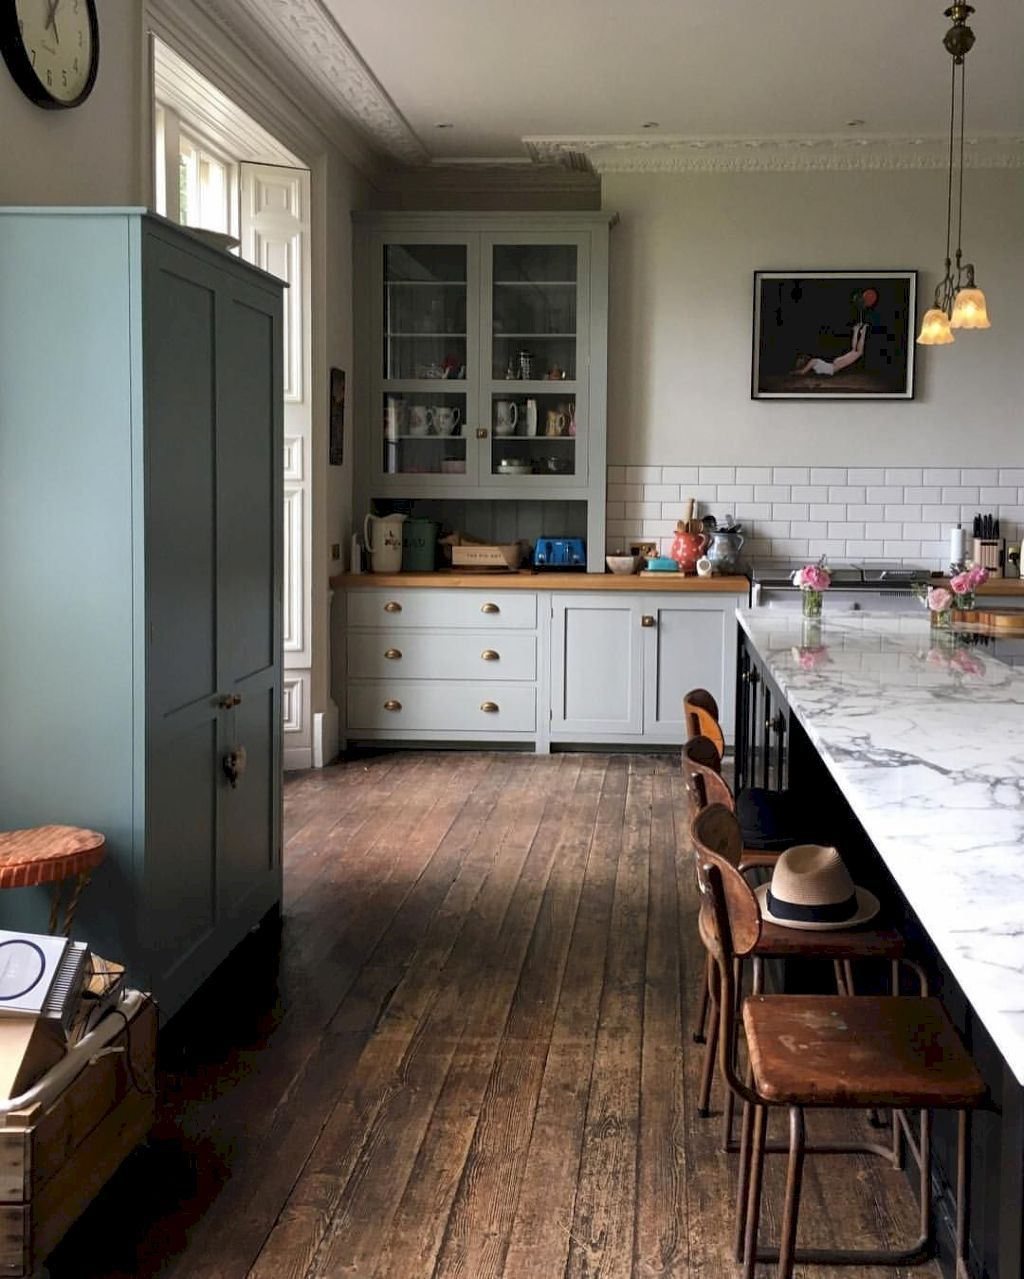 Best Rustic Farmhouse Kitchen Cabinets Ideas Farmhouse kitchen